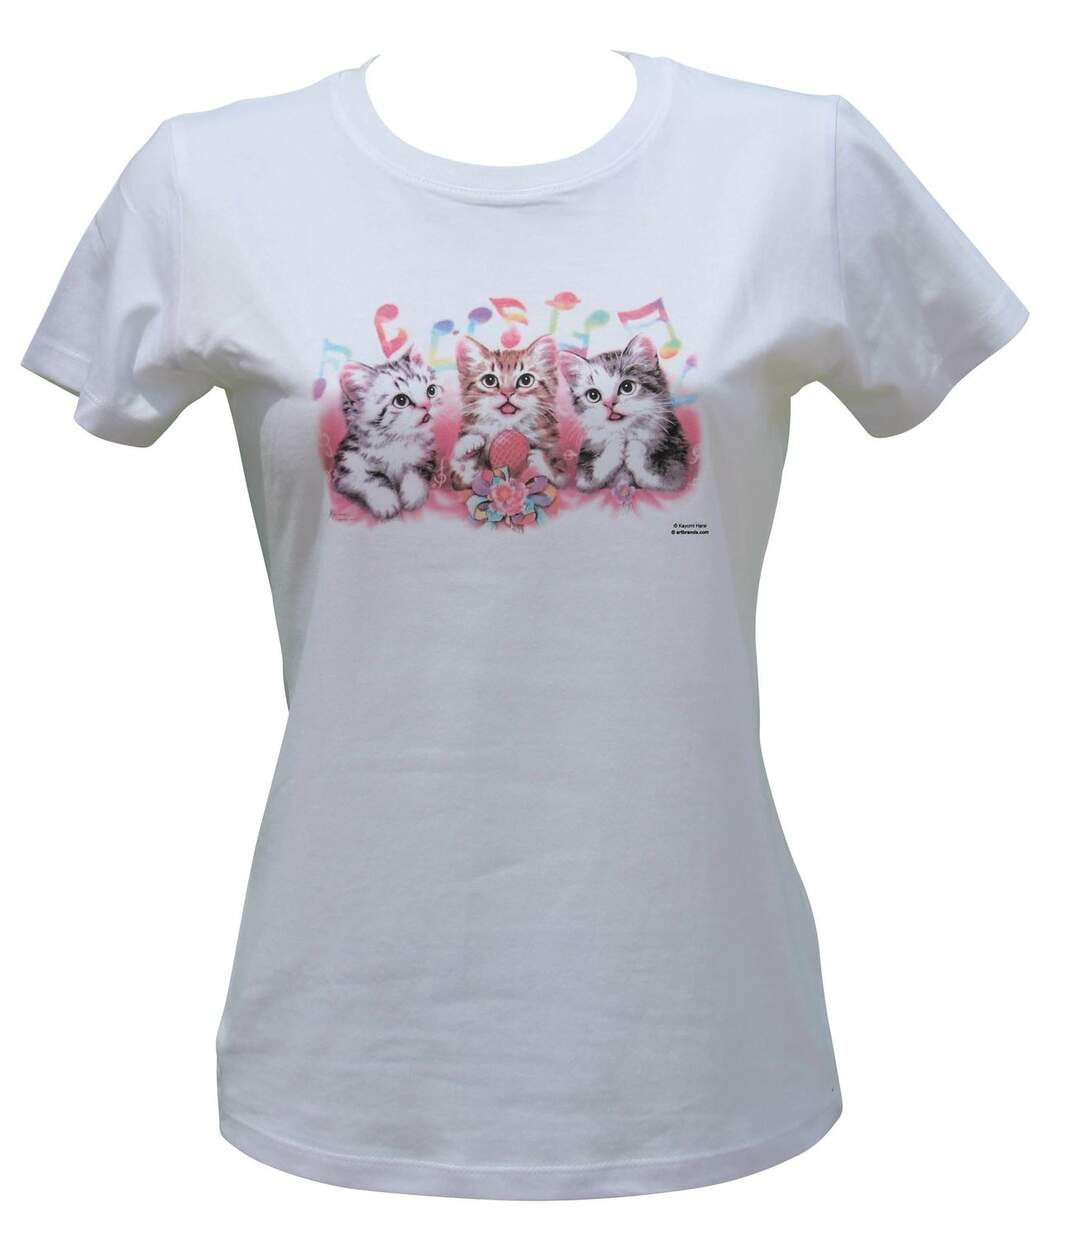 T-shirt femme manches courtes - Chats solar 11774 - blanc